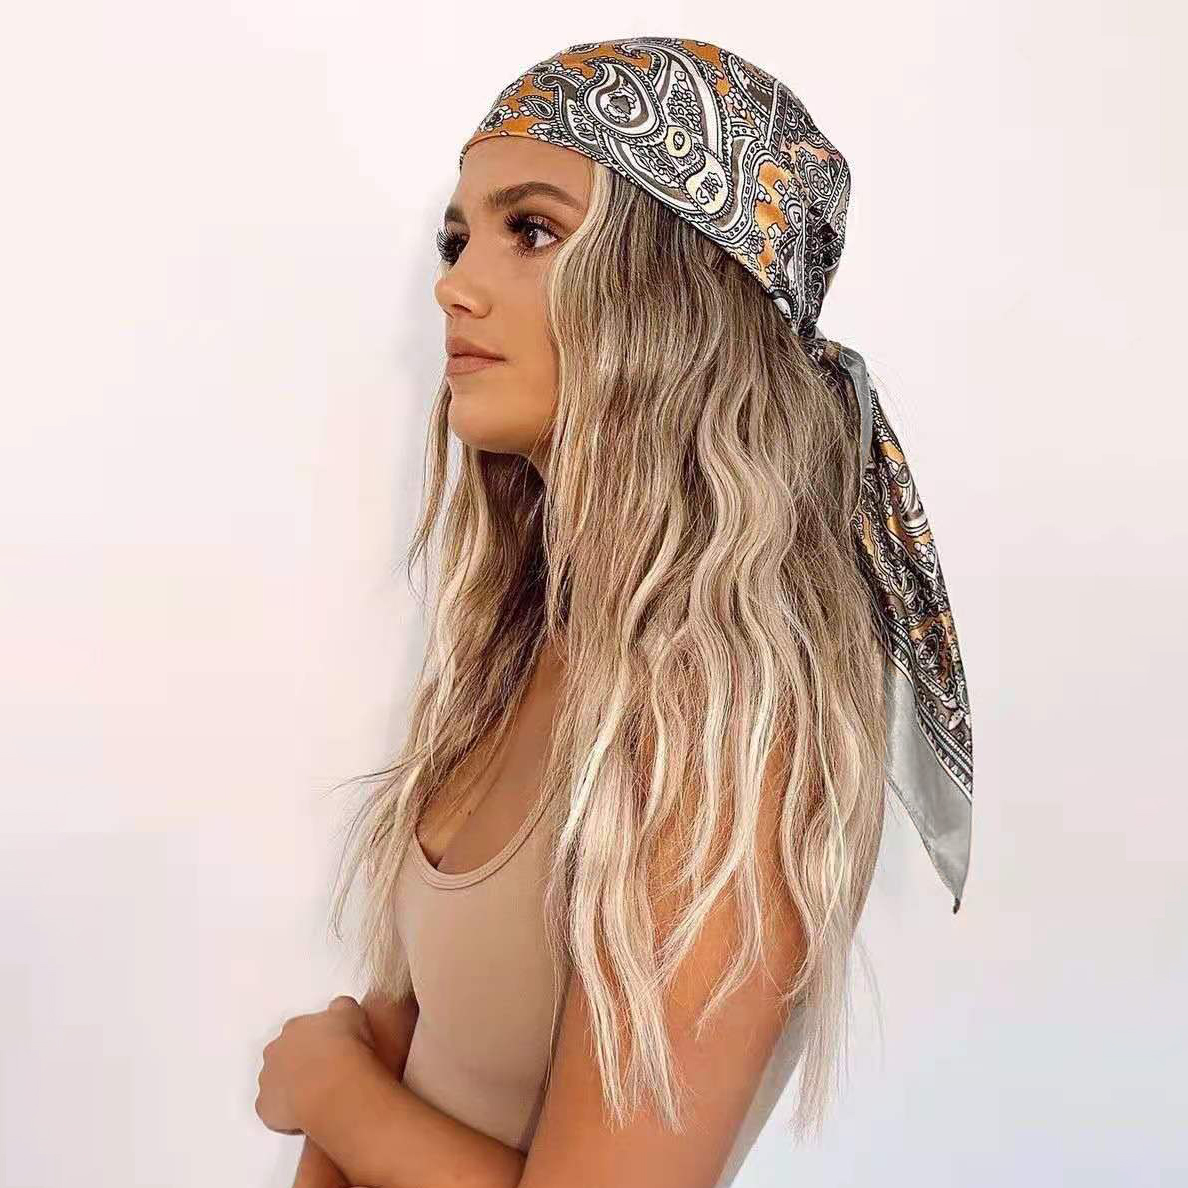 Luxury Brand Scarf Women Fashion Designer Beautiful Foulard Soft Satin Shawl Silk Kerchief 90*90cm Square Neck Headscarf Bandana